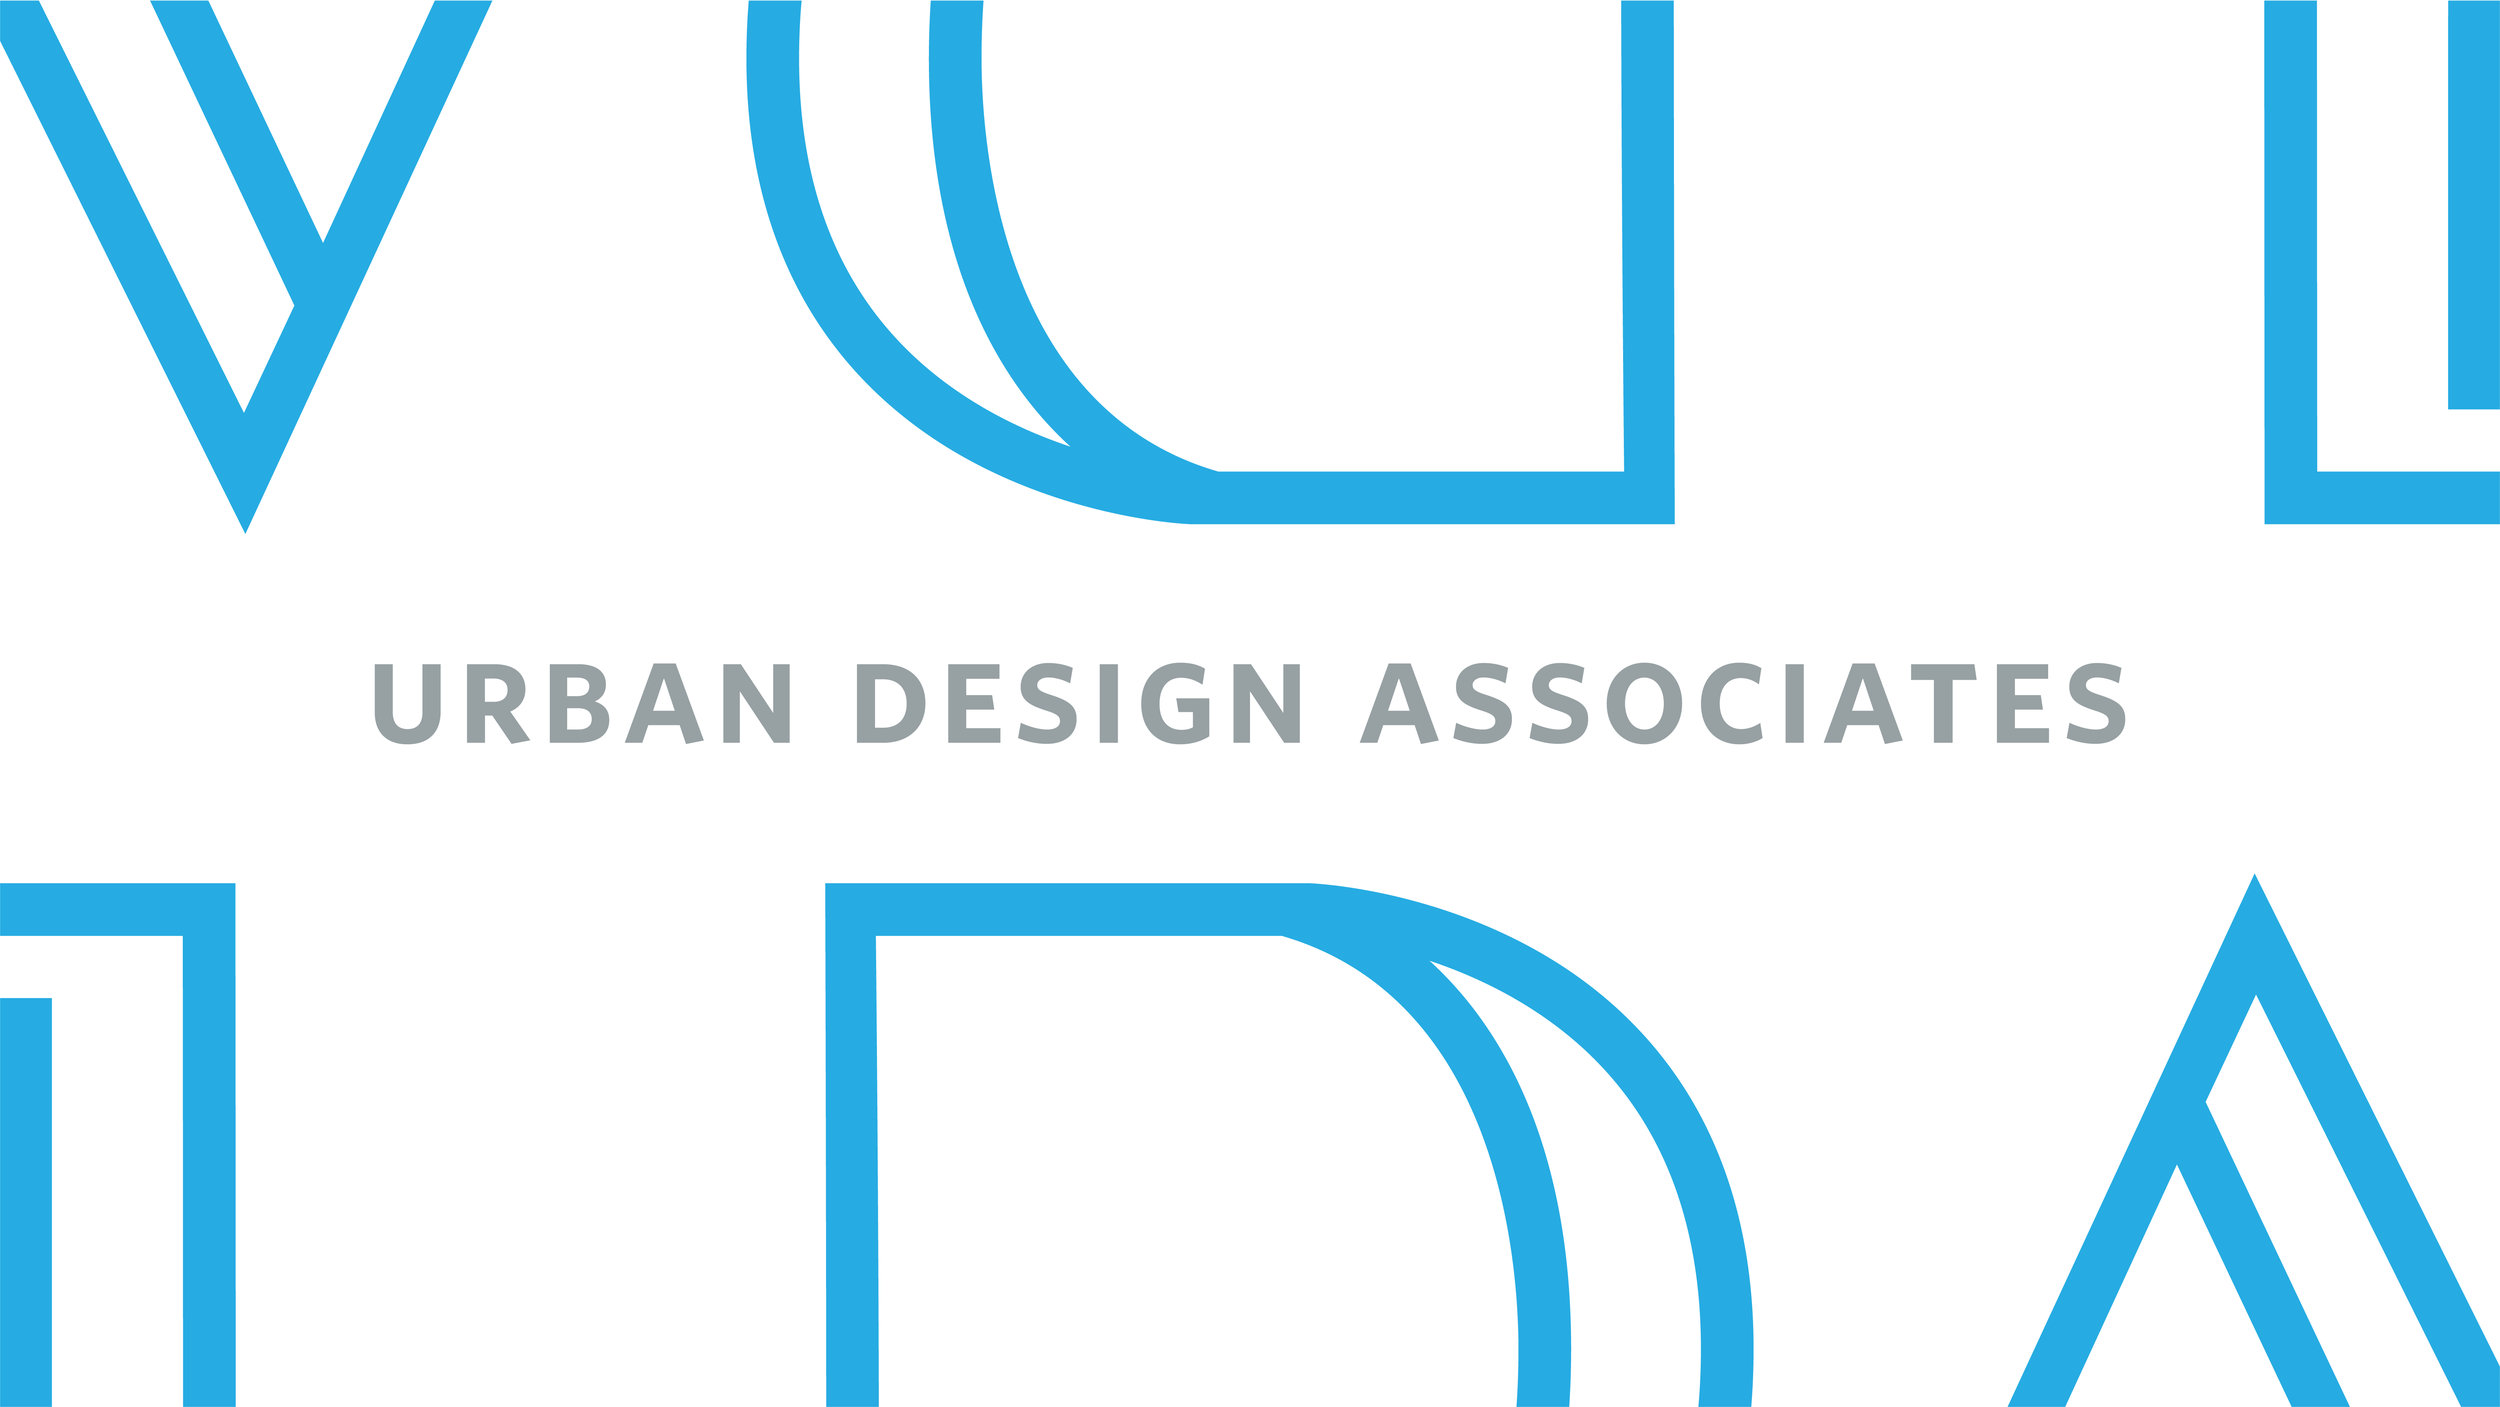 Design-and-Architcture_Branding_Urban-Design-Associates_Bootstrap-Design-Co-01.jpg